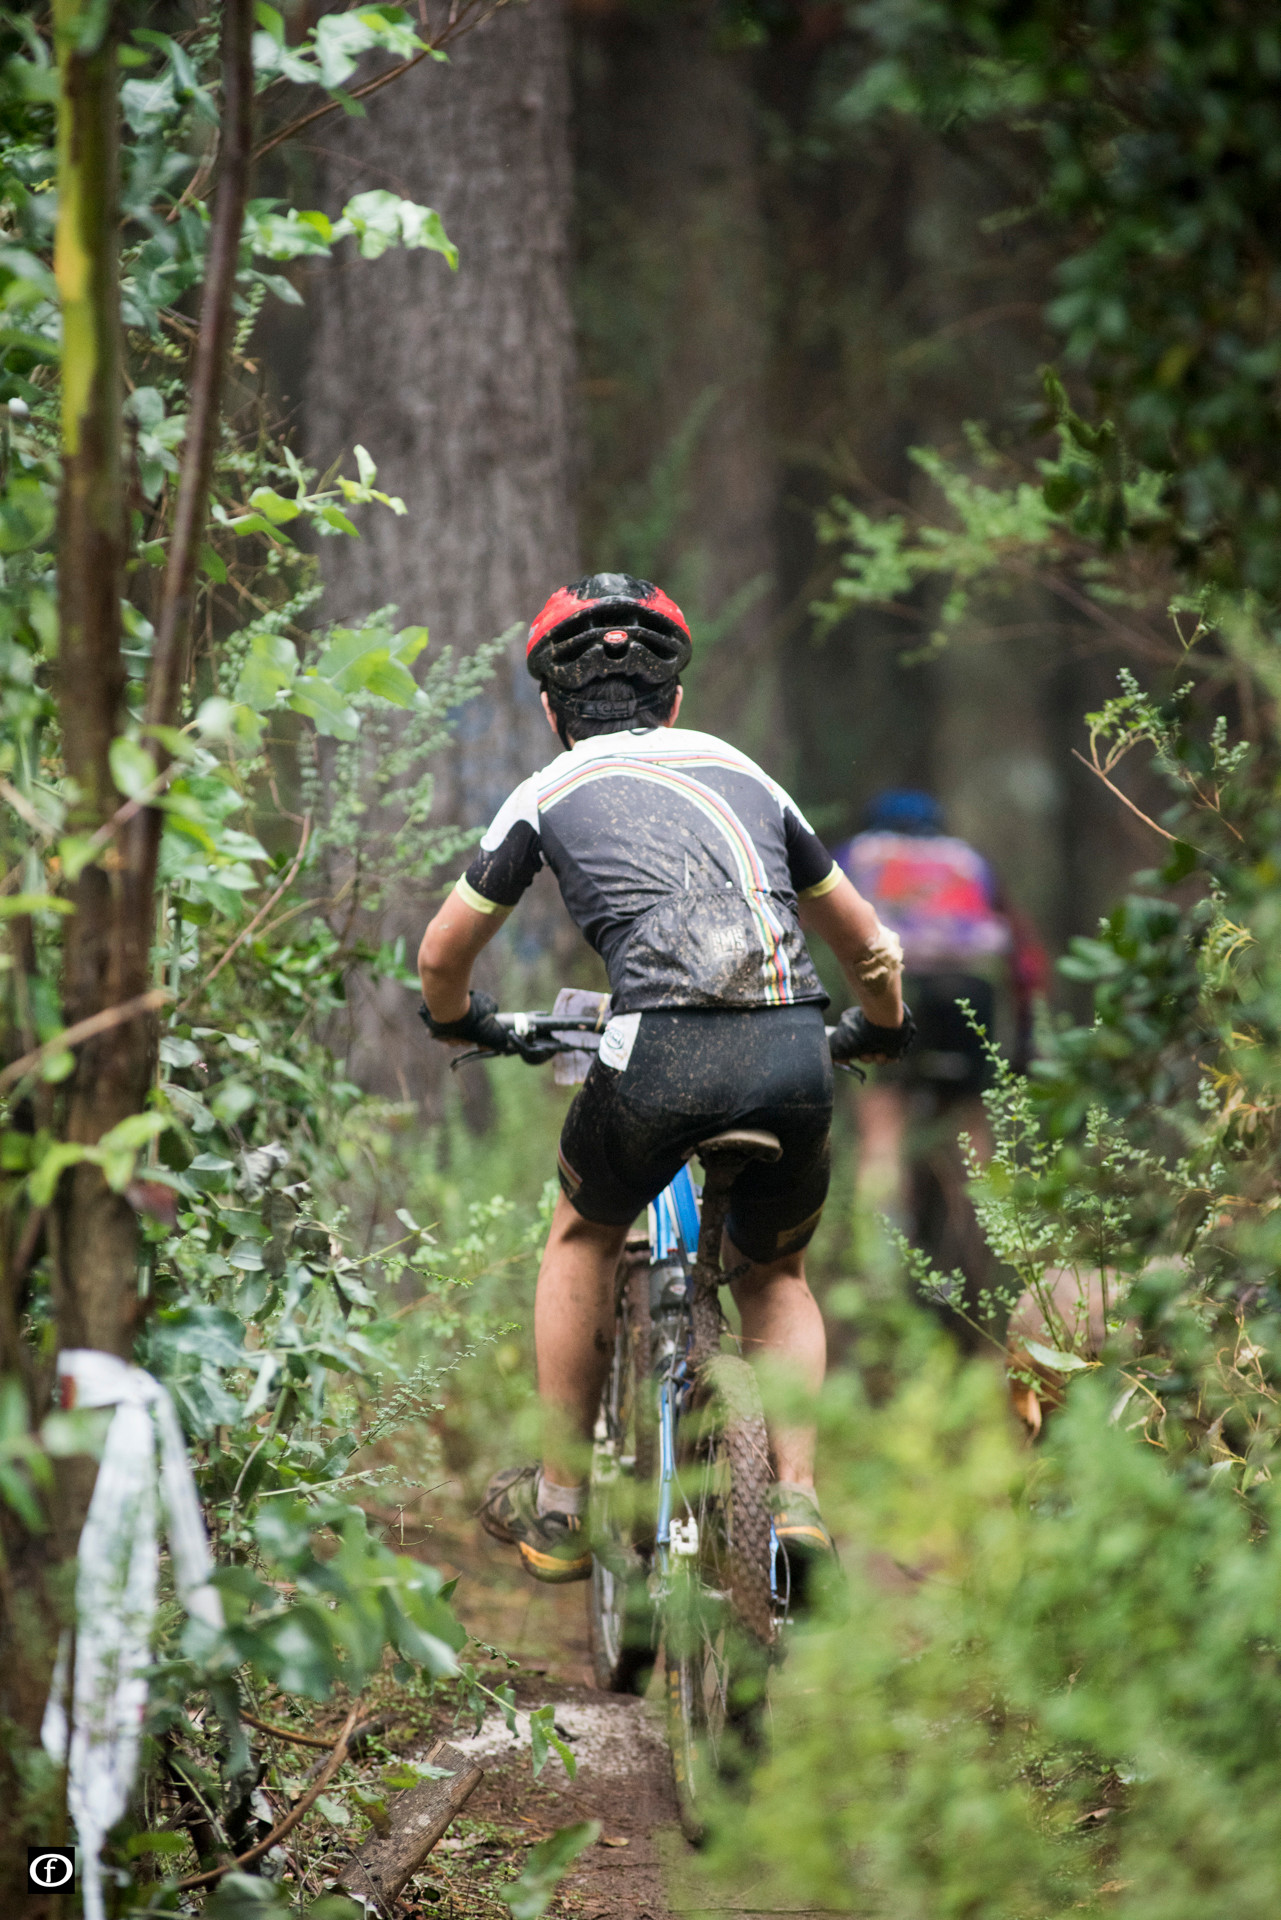 2015-05-17-Ciclismo Enduro-55.jpg